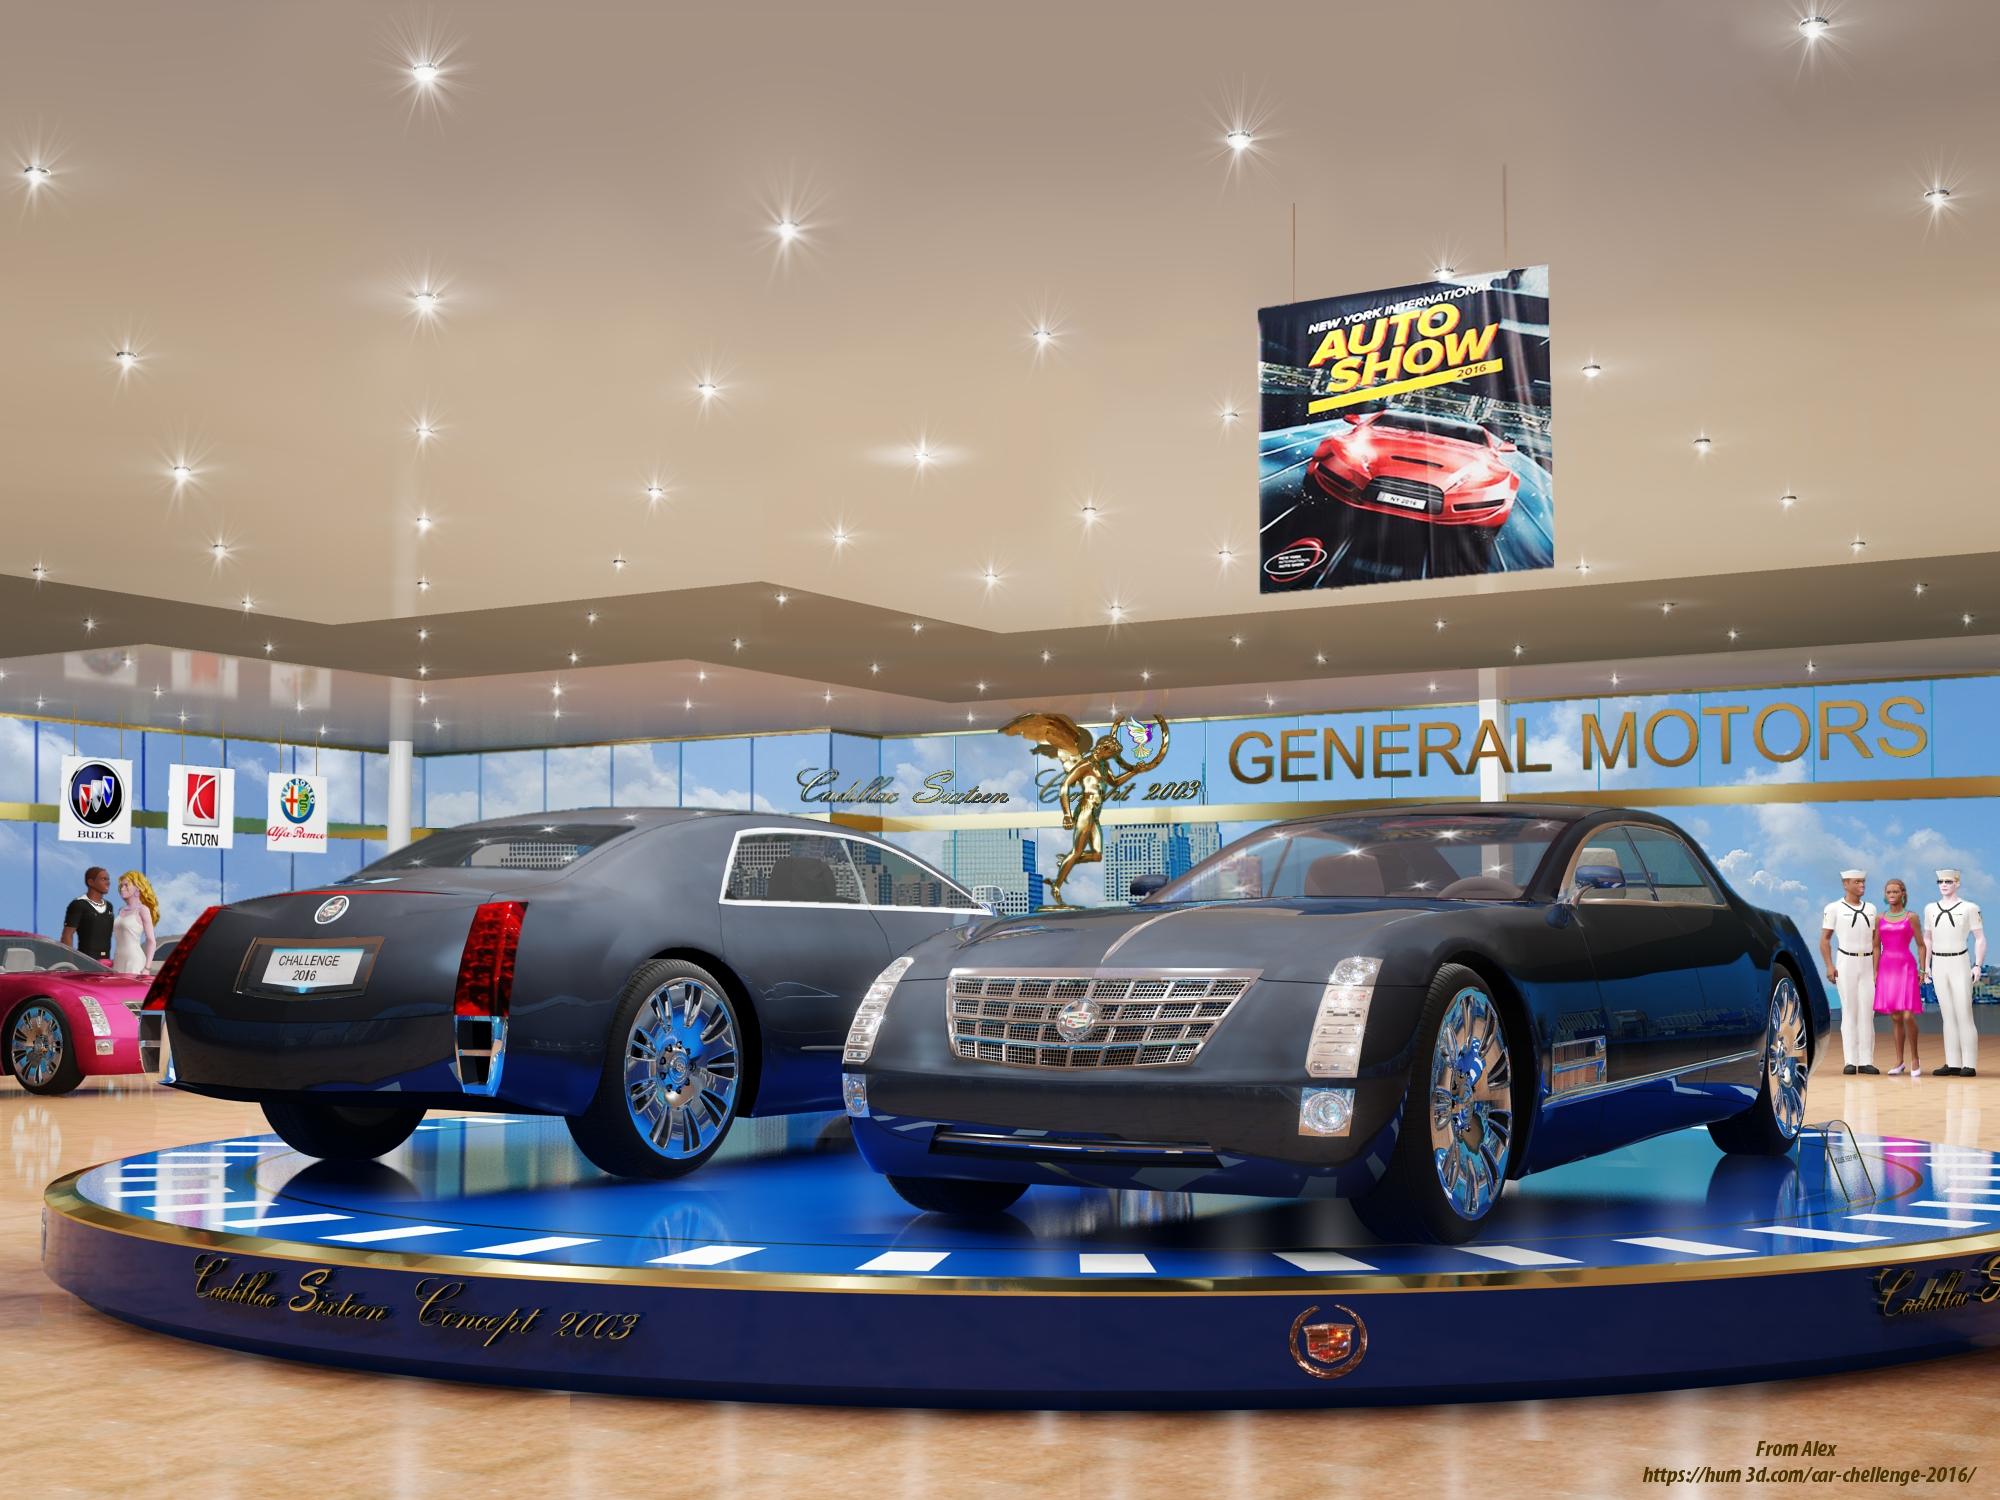 Cadillac sixsteen Concept 2003 3d art